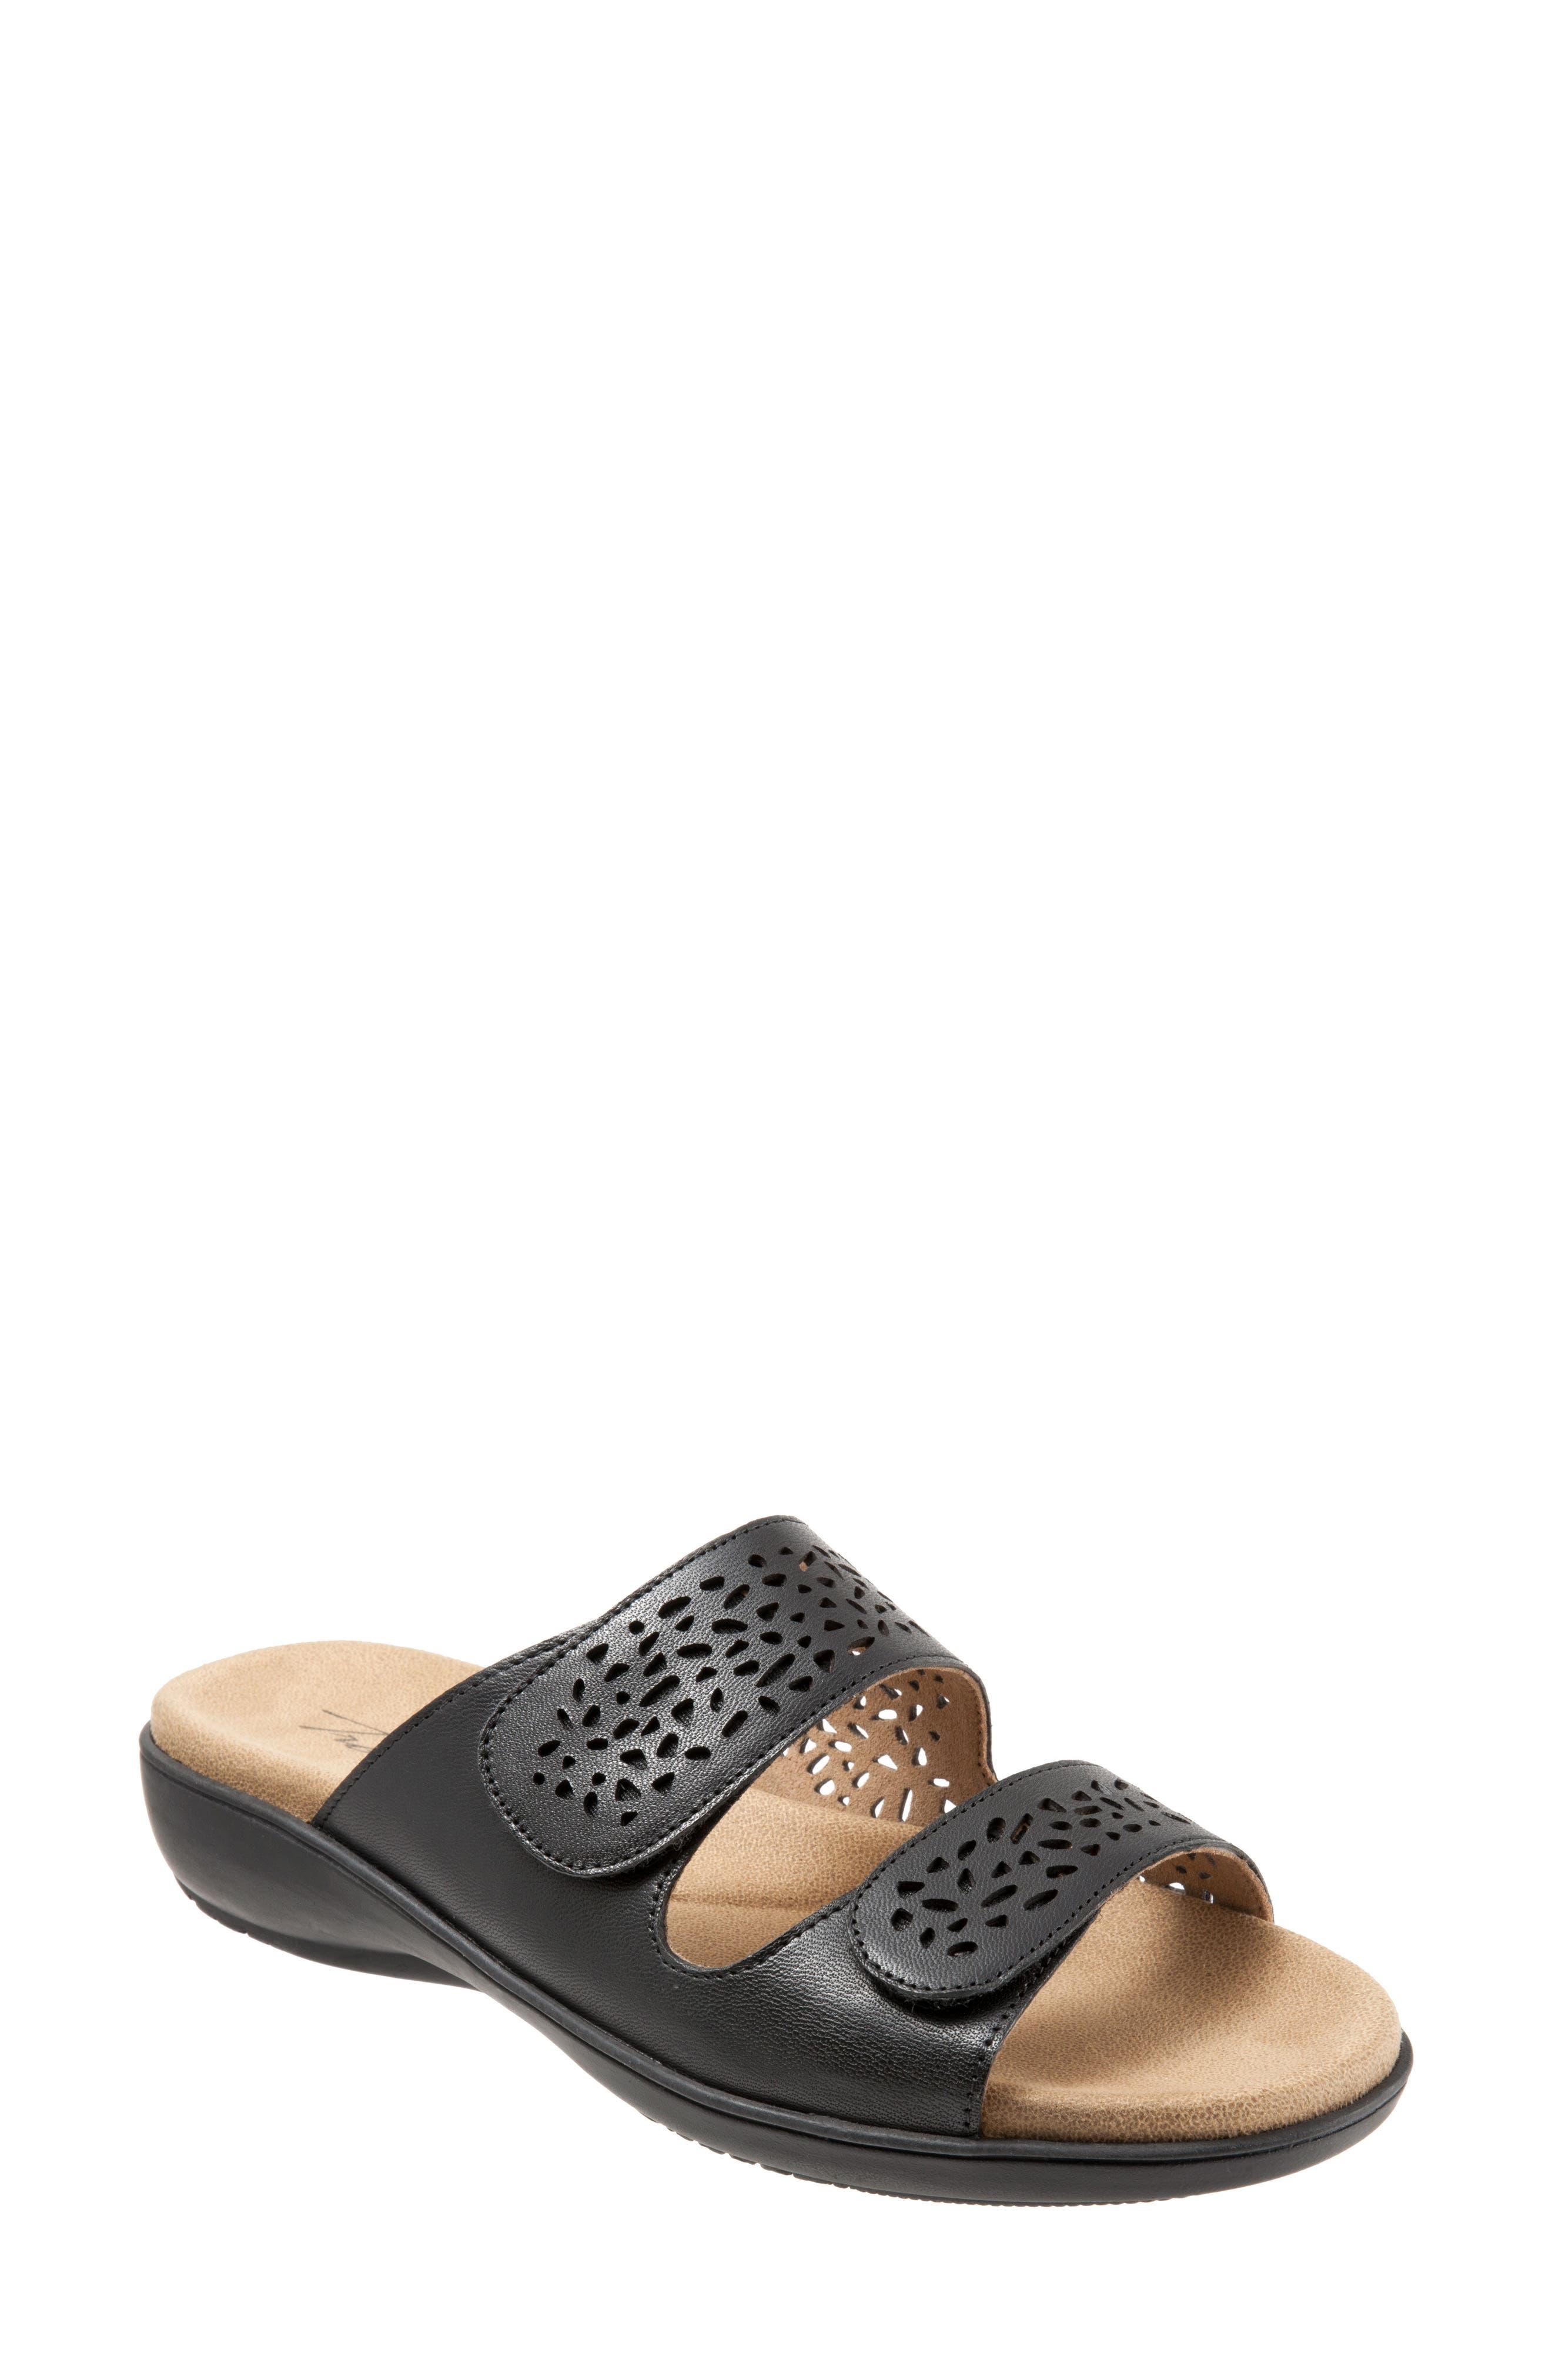 TROTTERS Tokie Sandal, Main, color, BLACK LEATHER